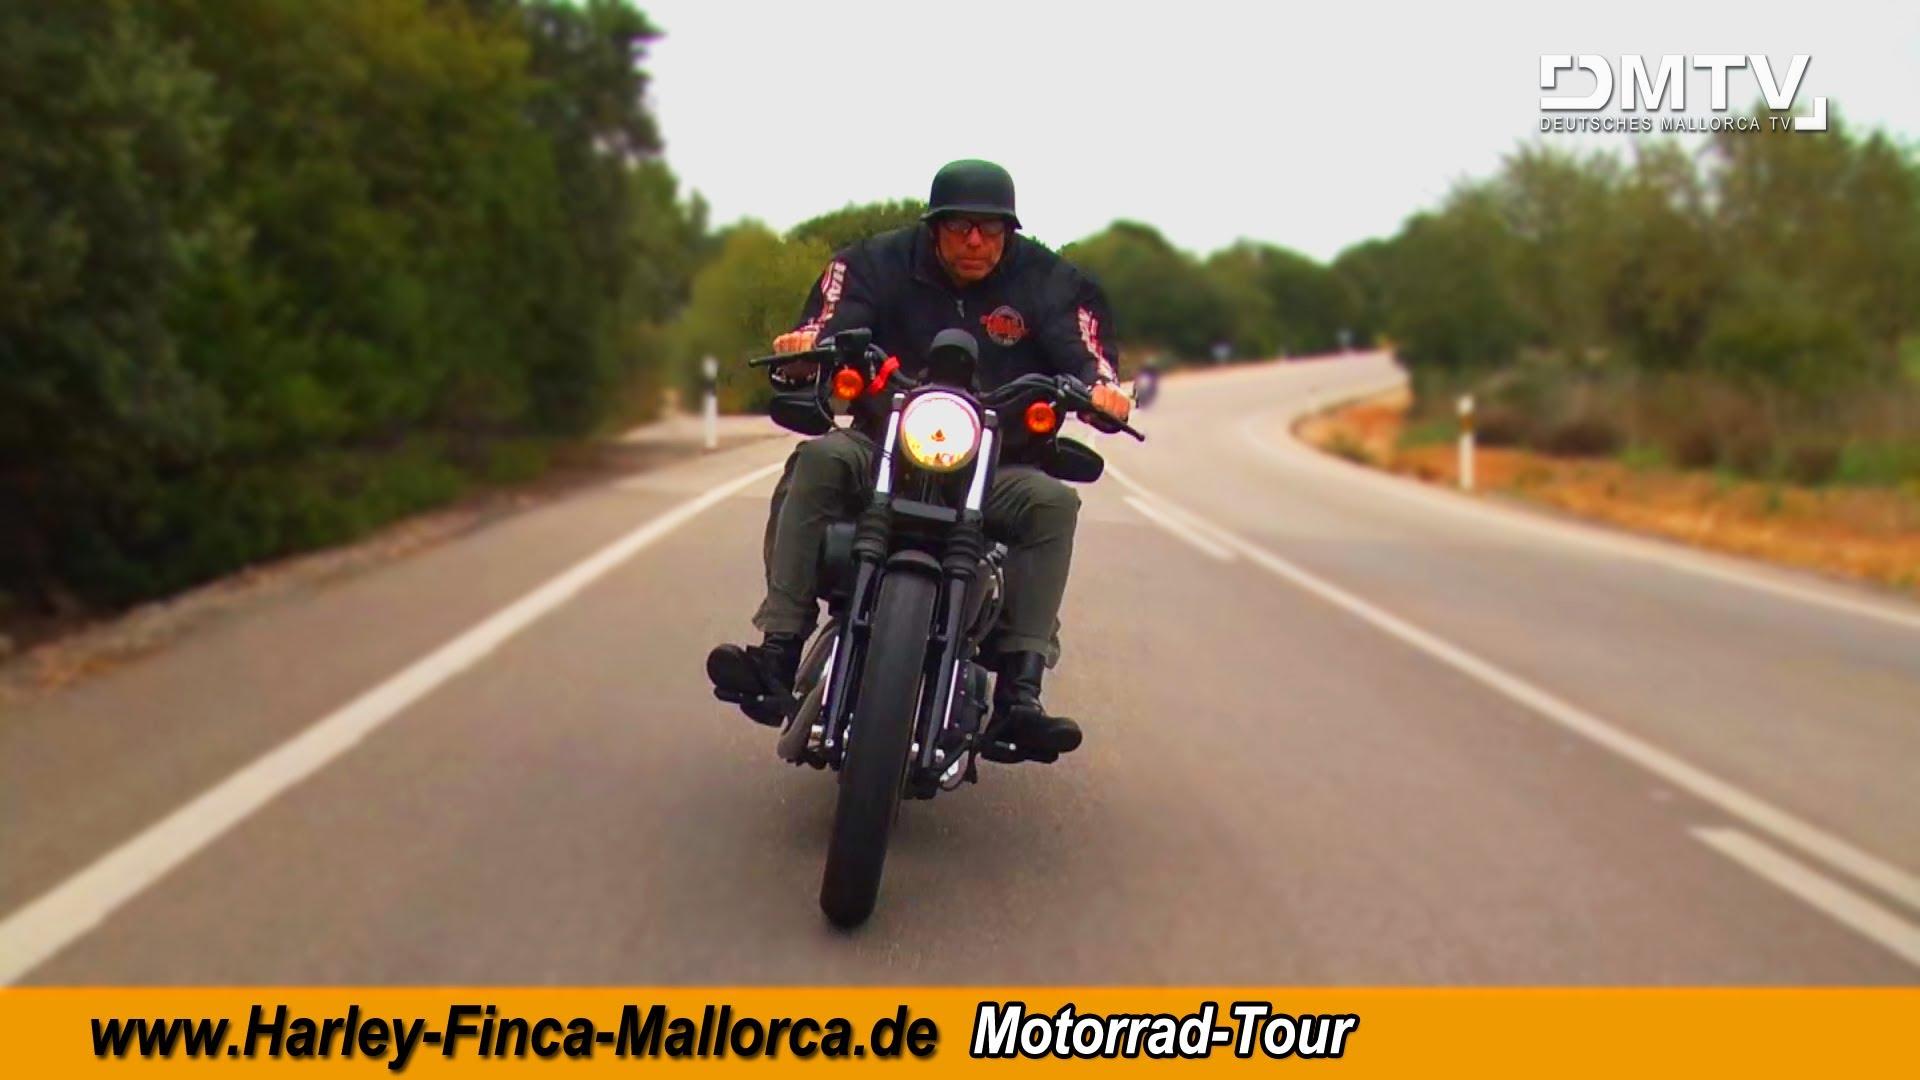 HARLEY-FINCA-MALLORCA - HARLEY TOUR AUCH IM WINTER